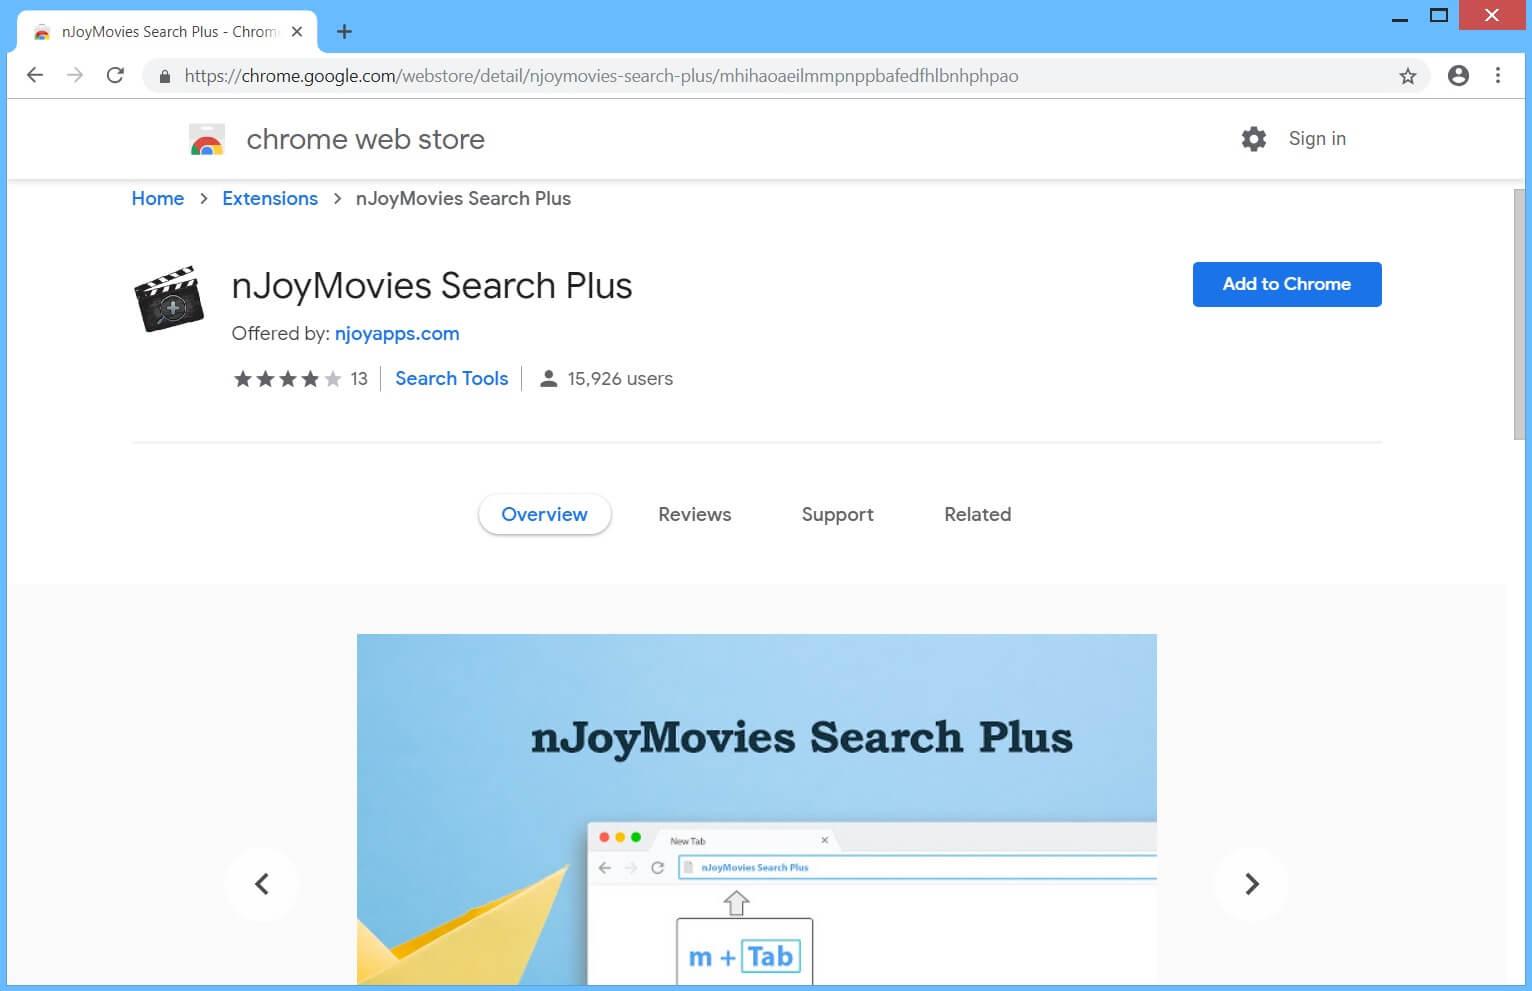 nJoyMovies search plus hijacker chrome web store